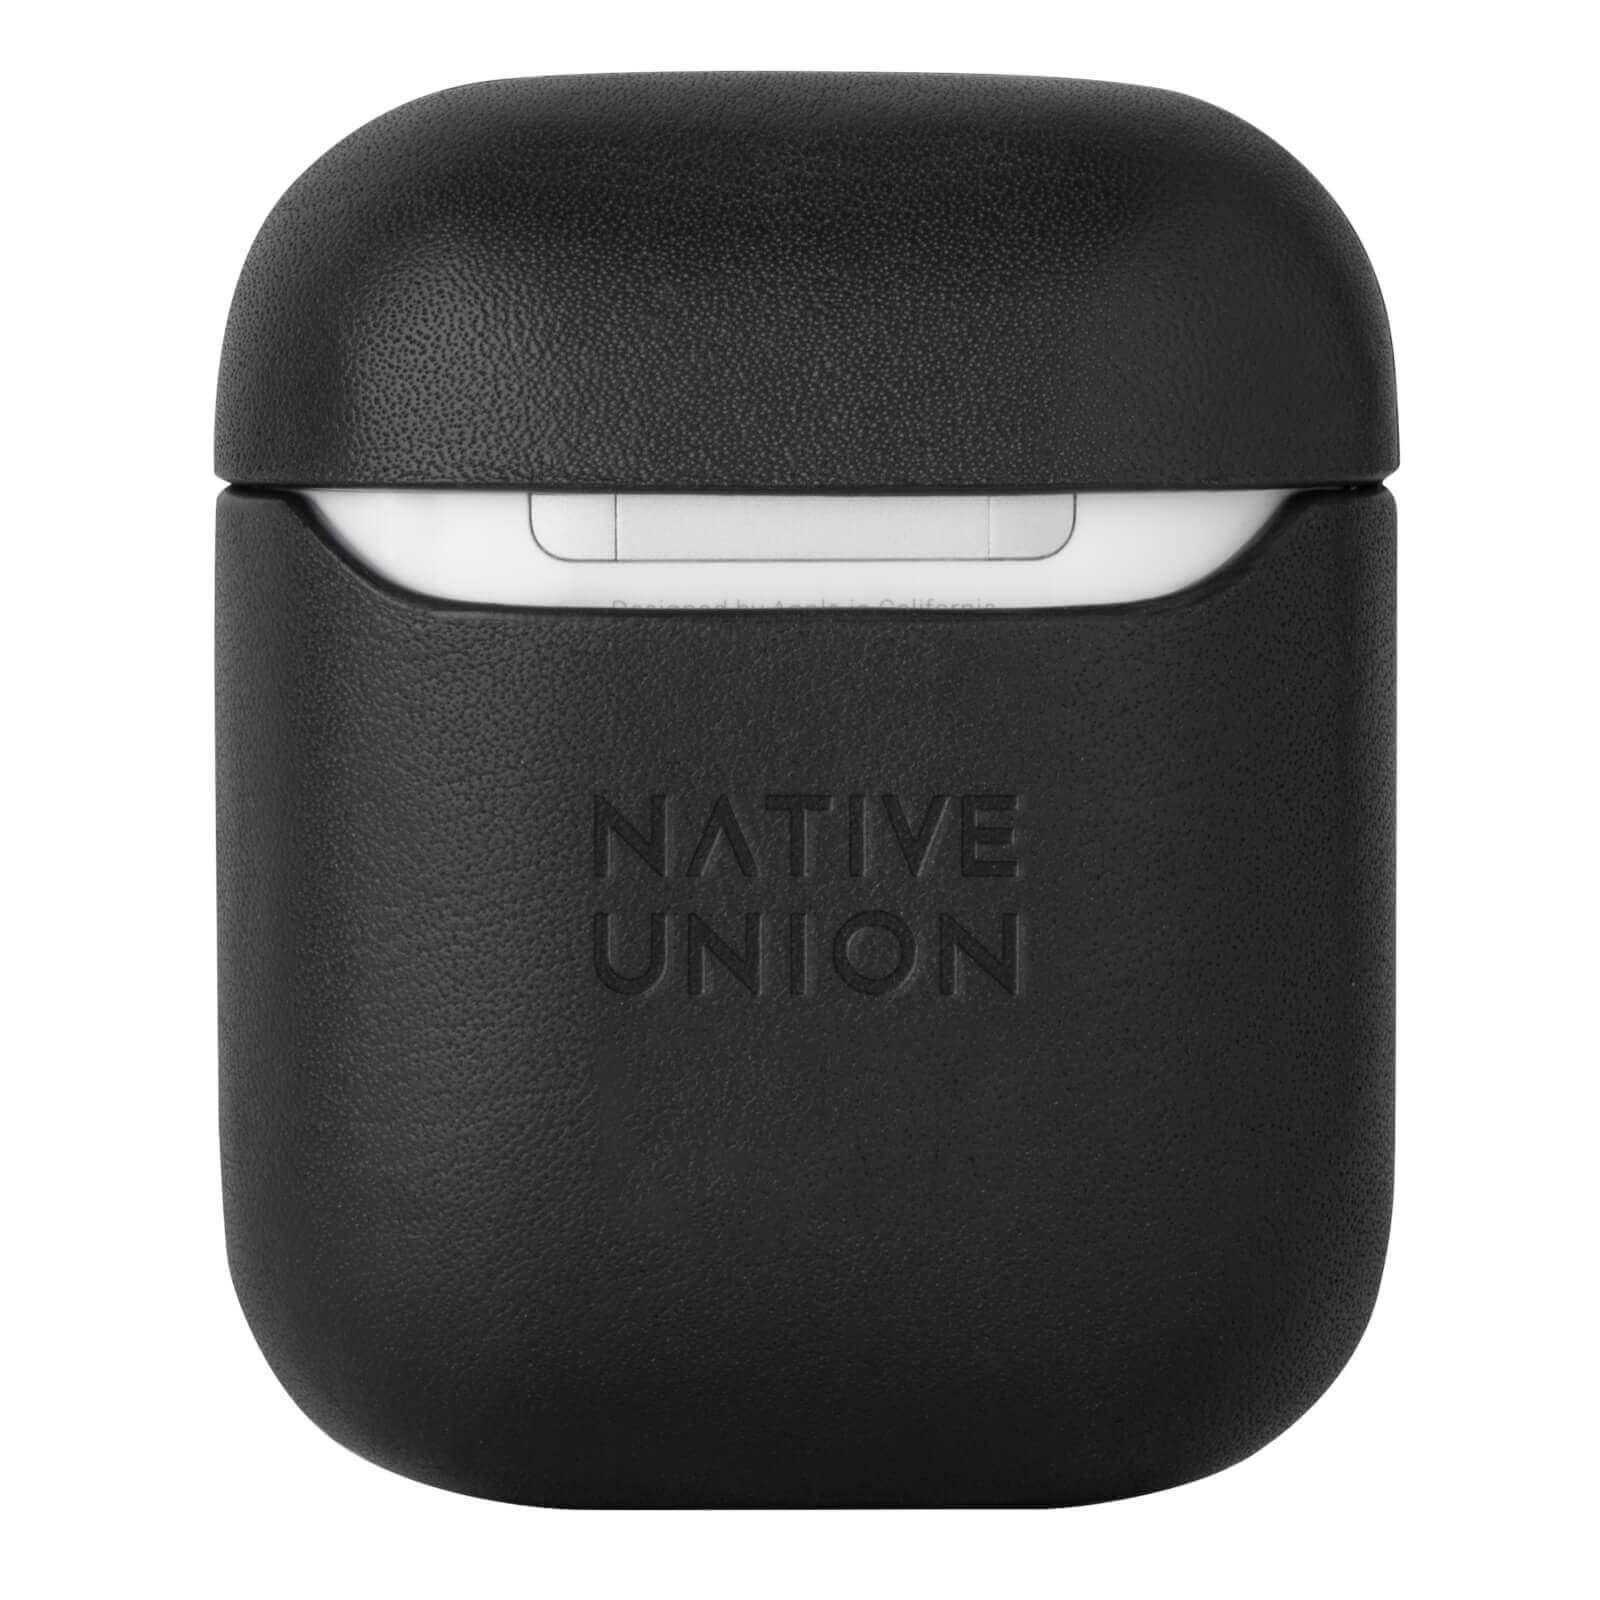 Native Union Classic Leather AirpodsCase - Black